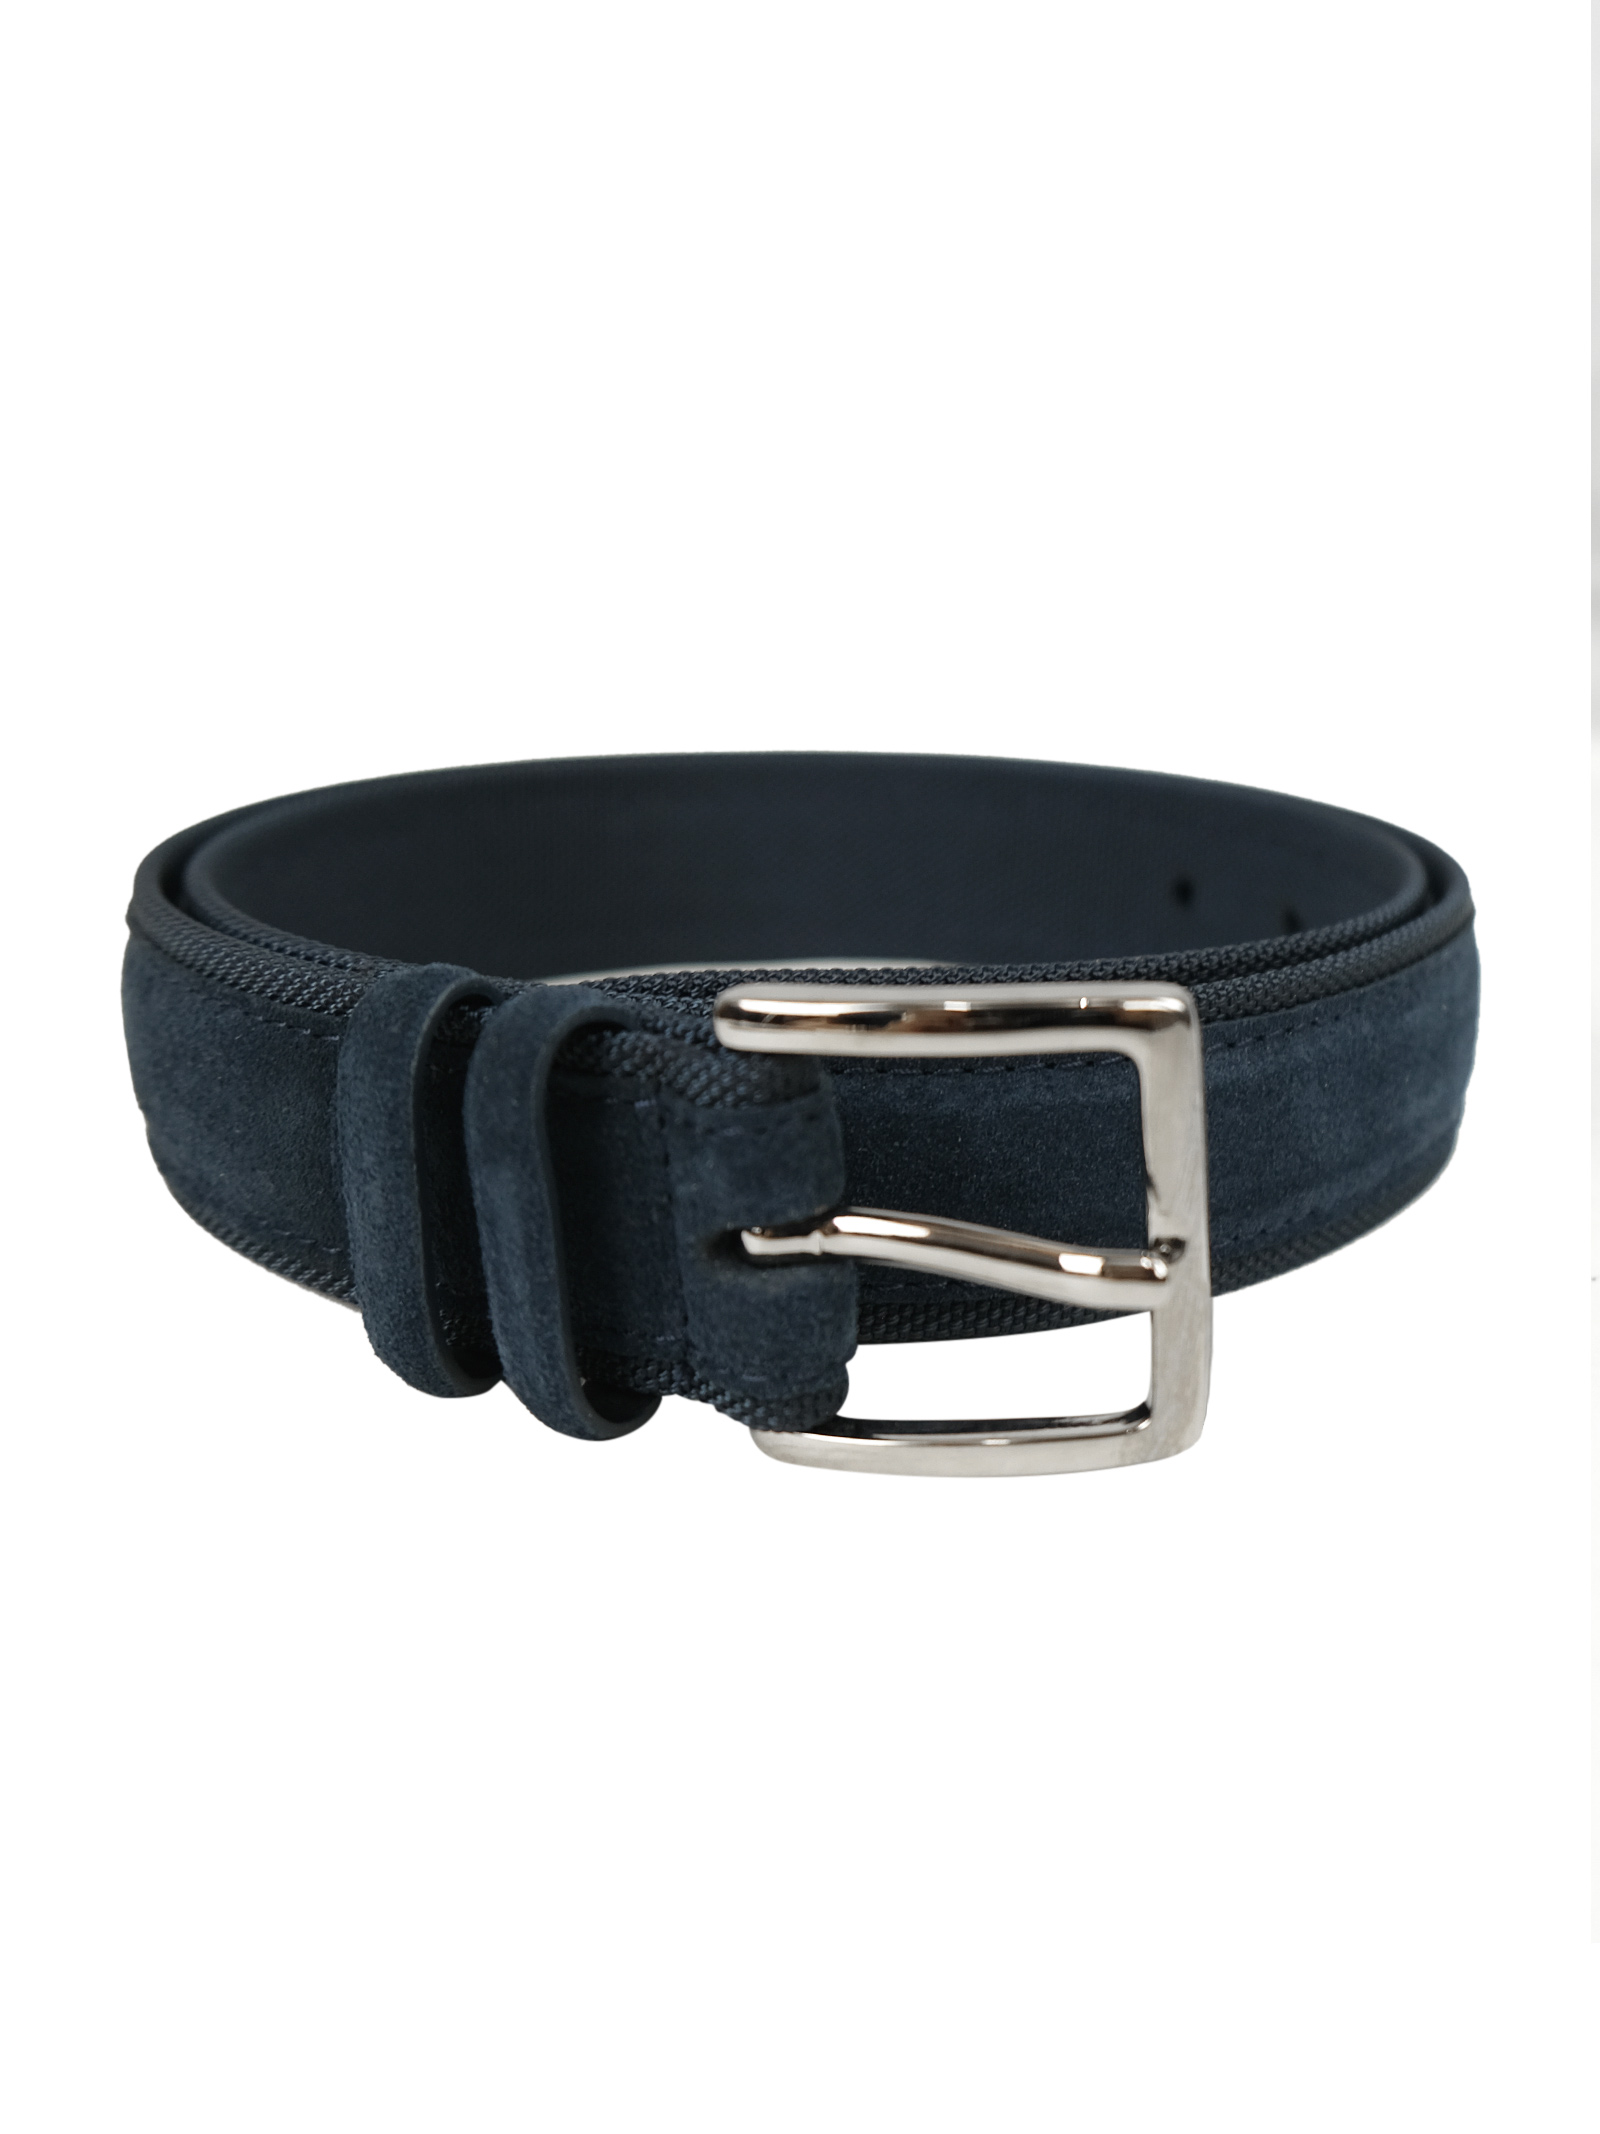 Cintura in camoscio e tessuto tecnico ORCIANI   Cinture   7927NOTTE